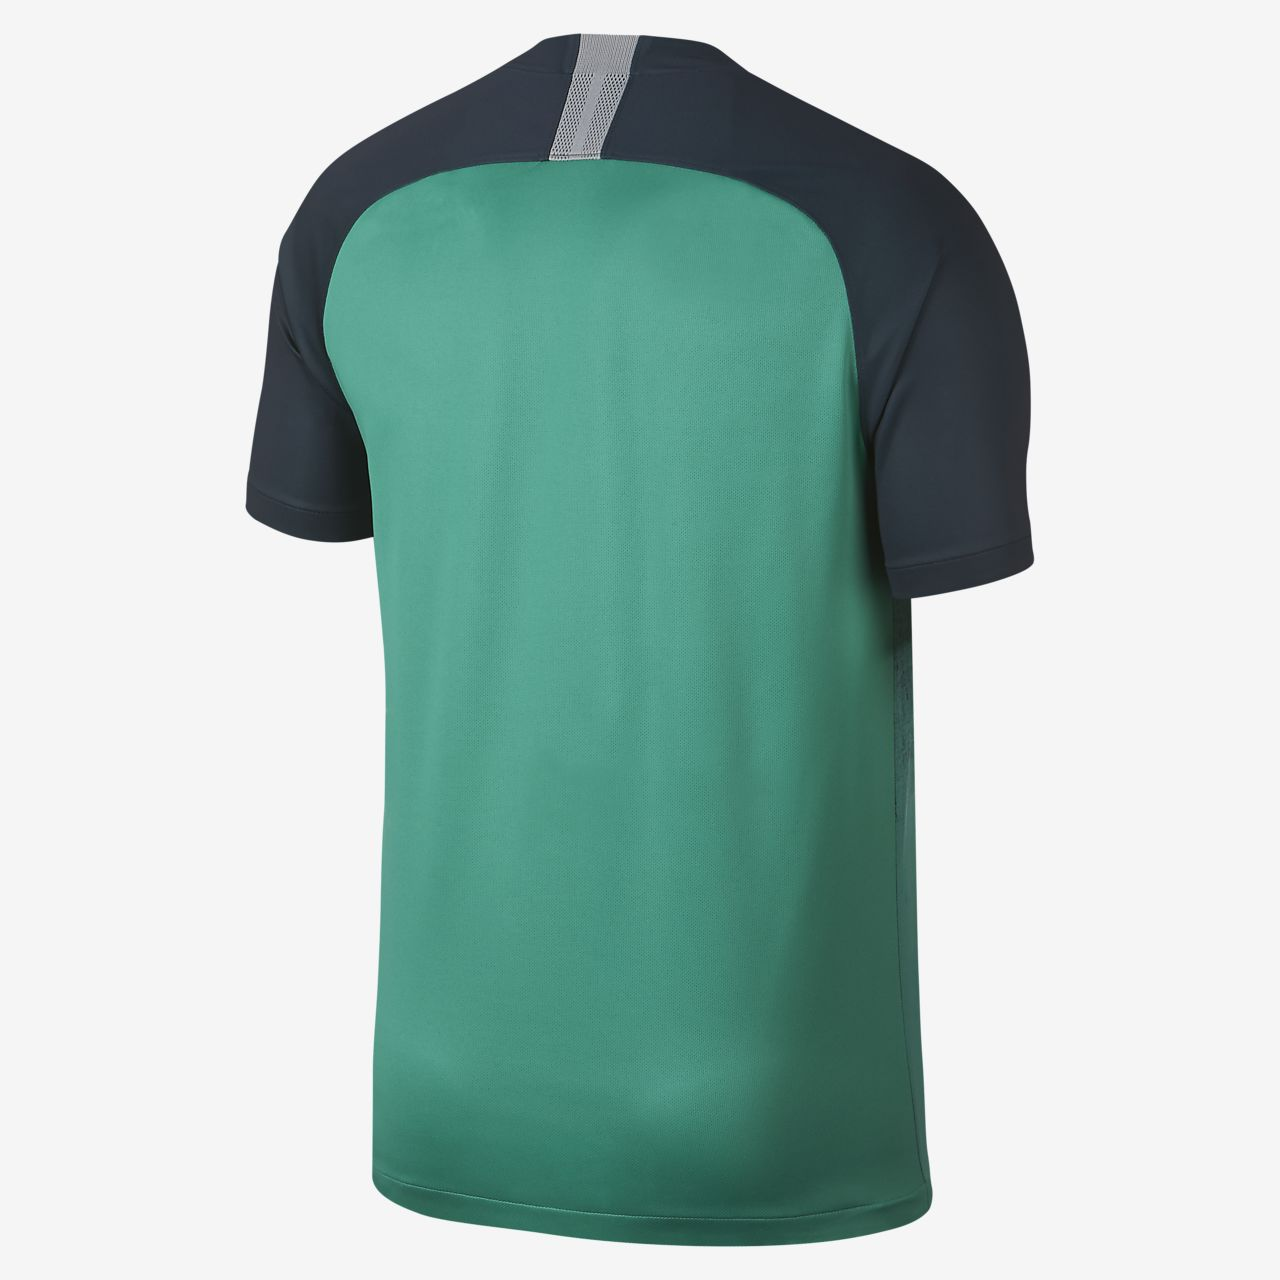 24c2e60ce 2018 19 Tottenham Hotspur Stadium Third Men s Football Shirt. Nike ...